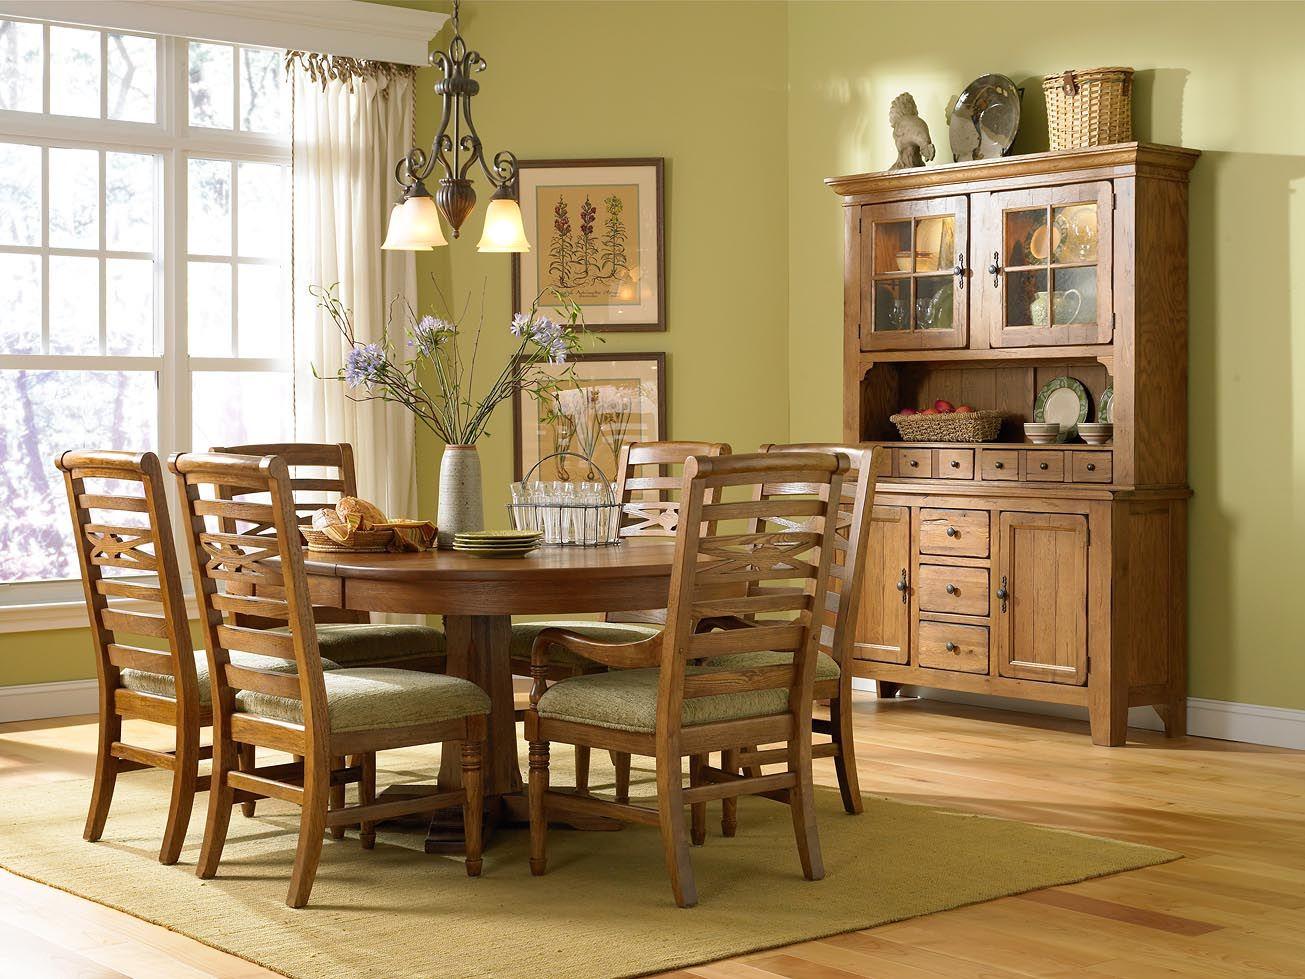 broyhill living room chairs 5 piece set my attic heirloom dining pedestool table